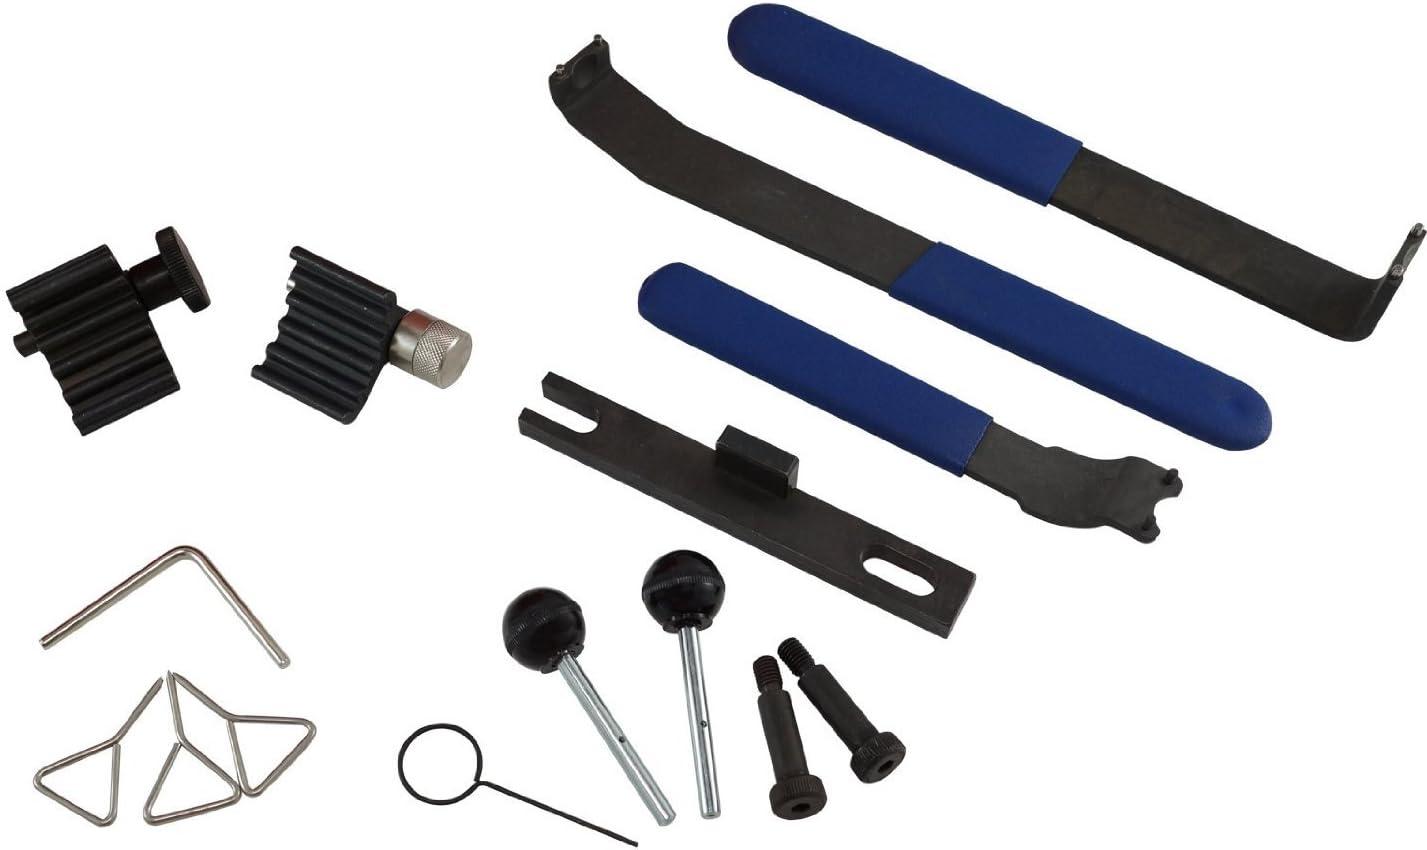 Timing Belt Tool Set For Tdi